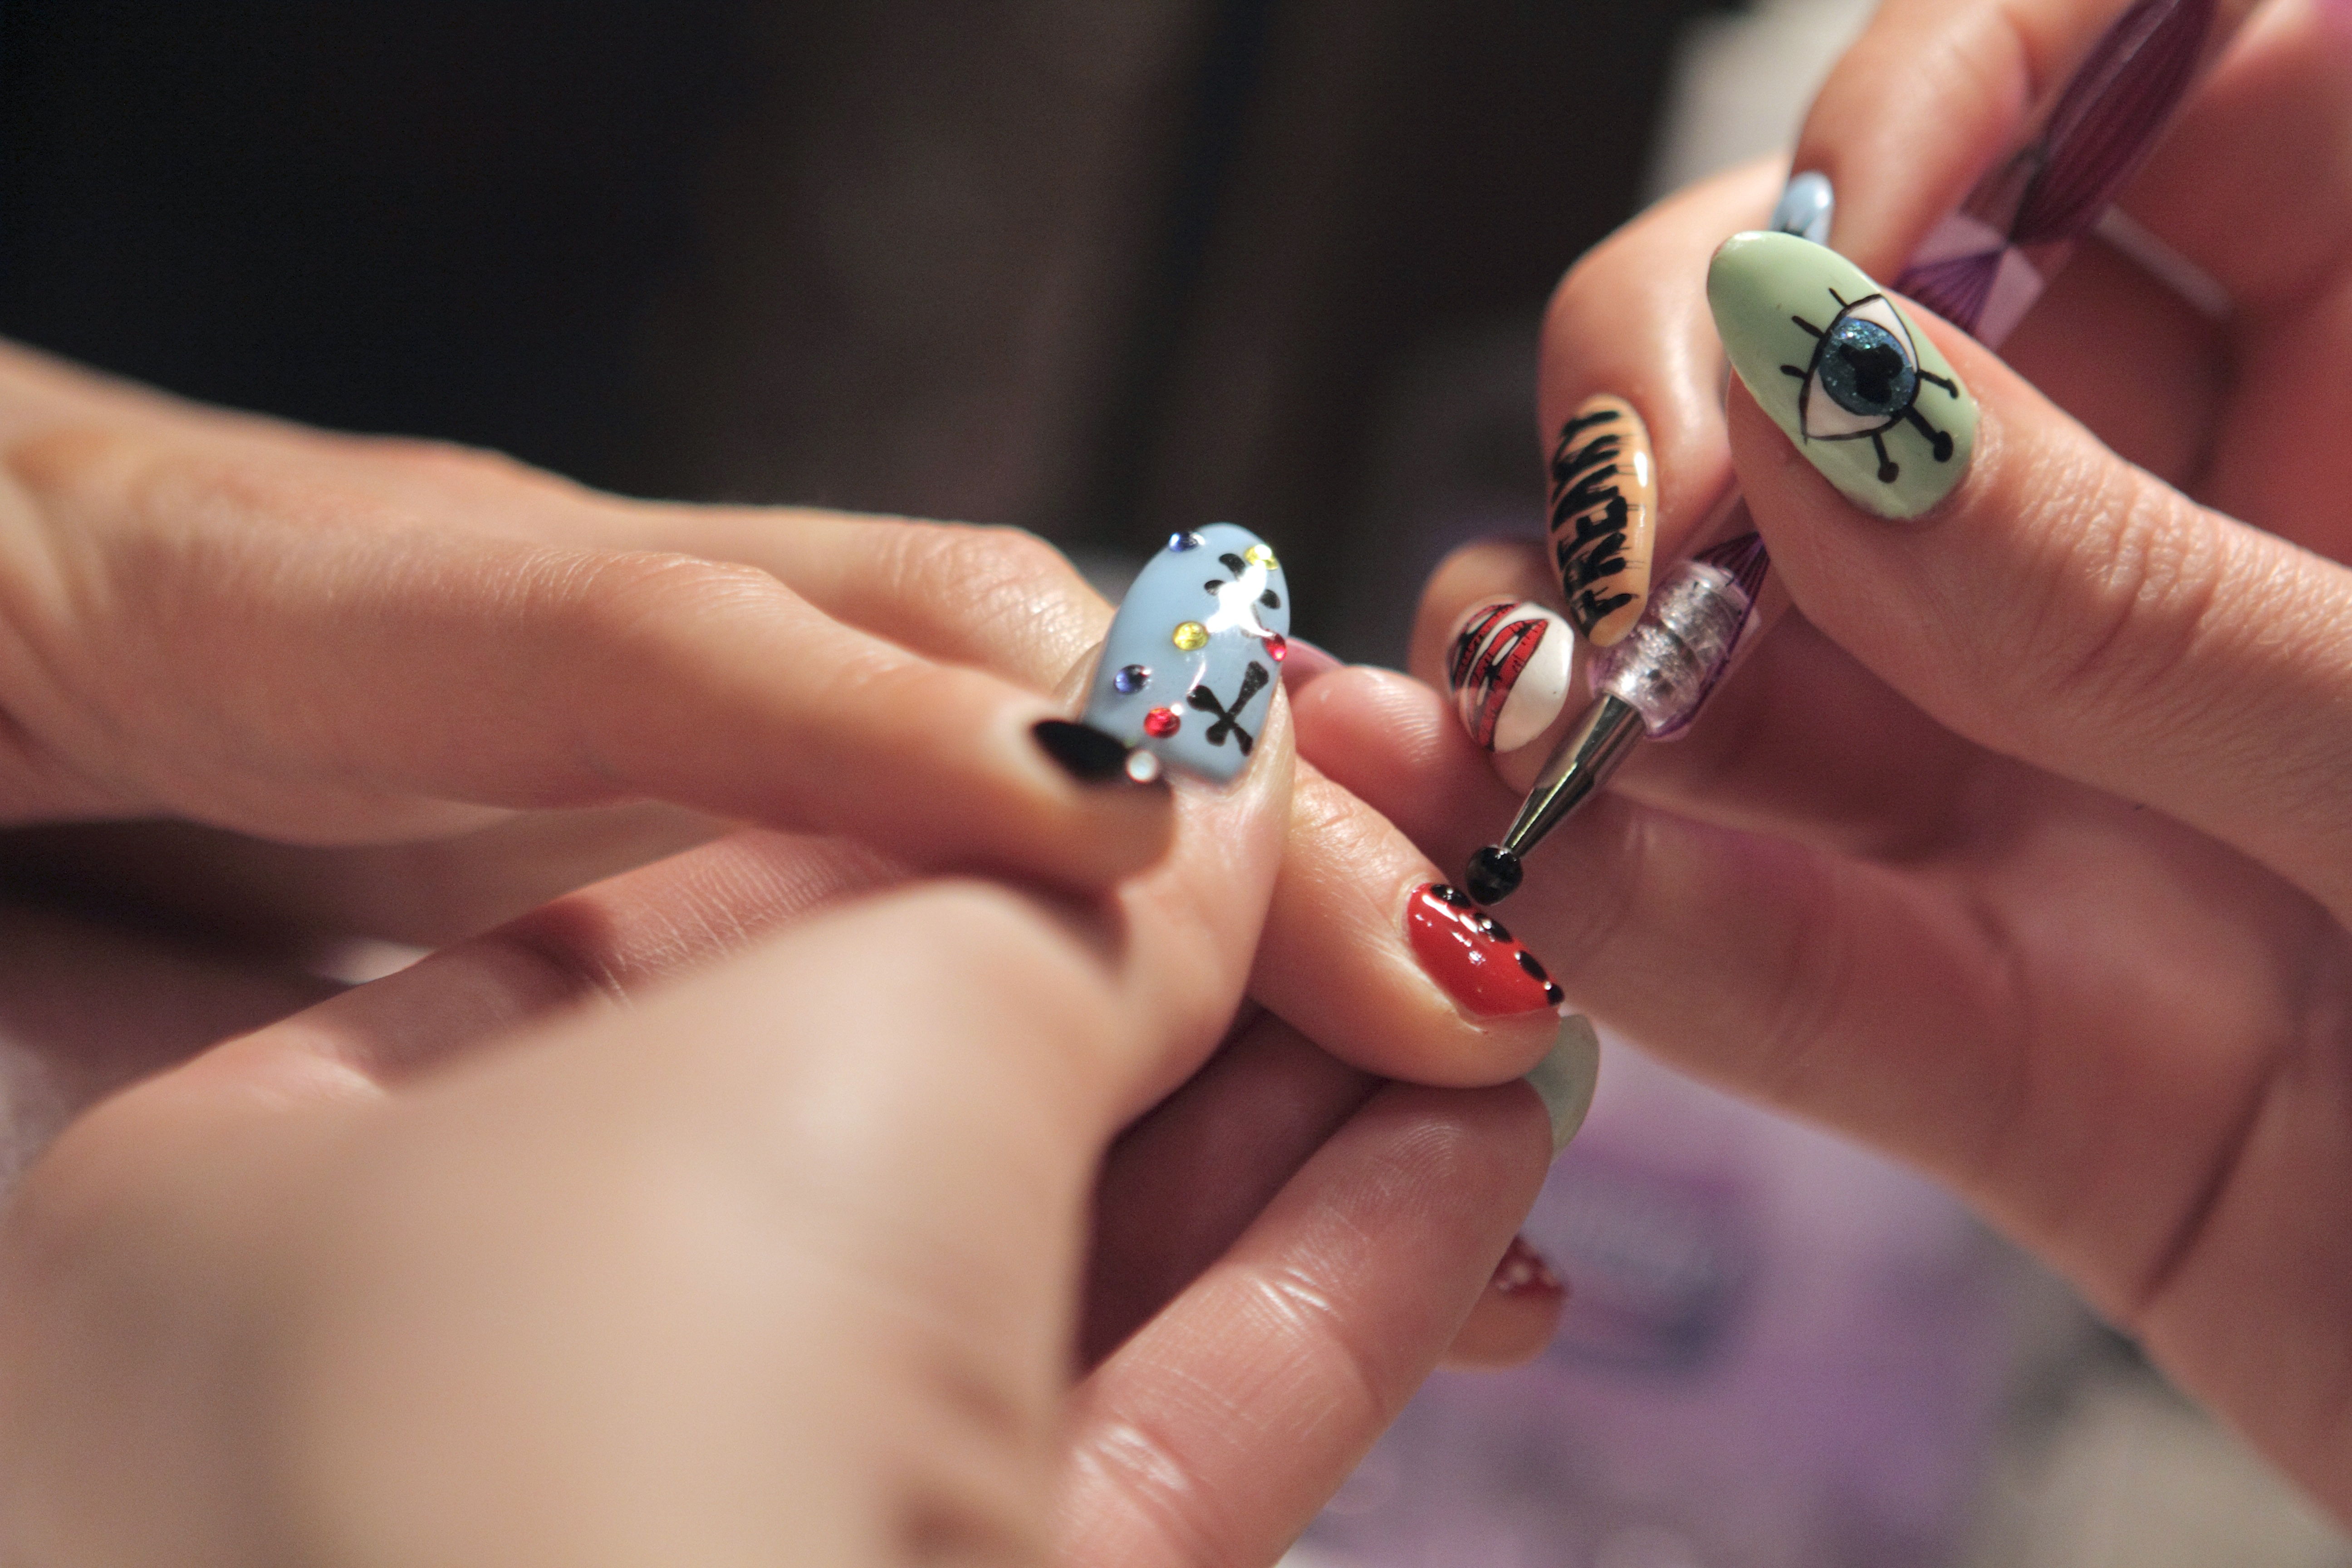 Nail art 2 13 reviews nail salons 2620 tamiami trl n naples nail nail art daytona beach fl best nail nail art 2 naples fl prinsesfo Gallery